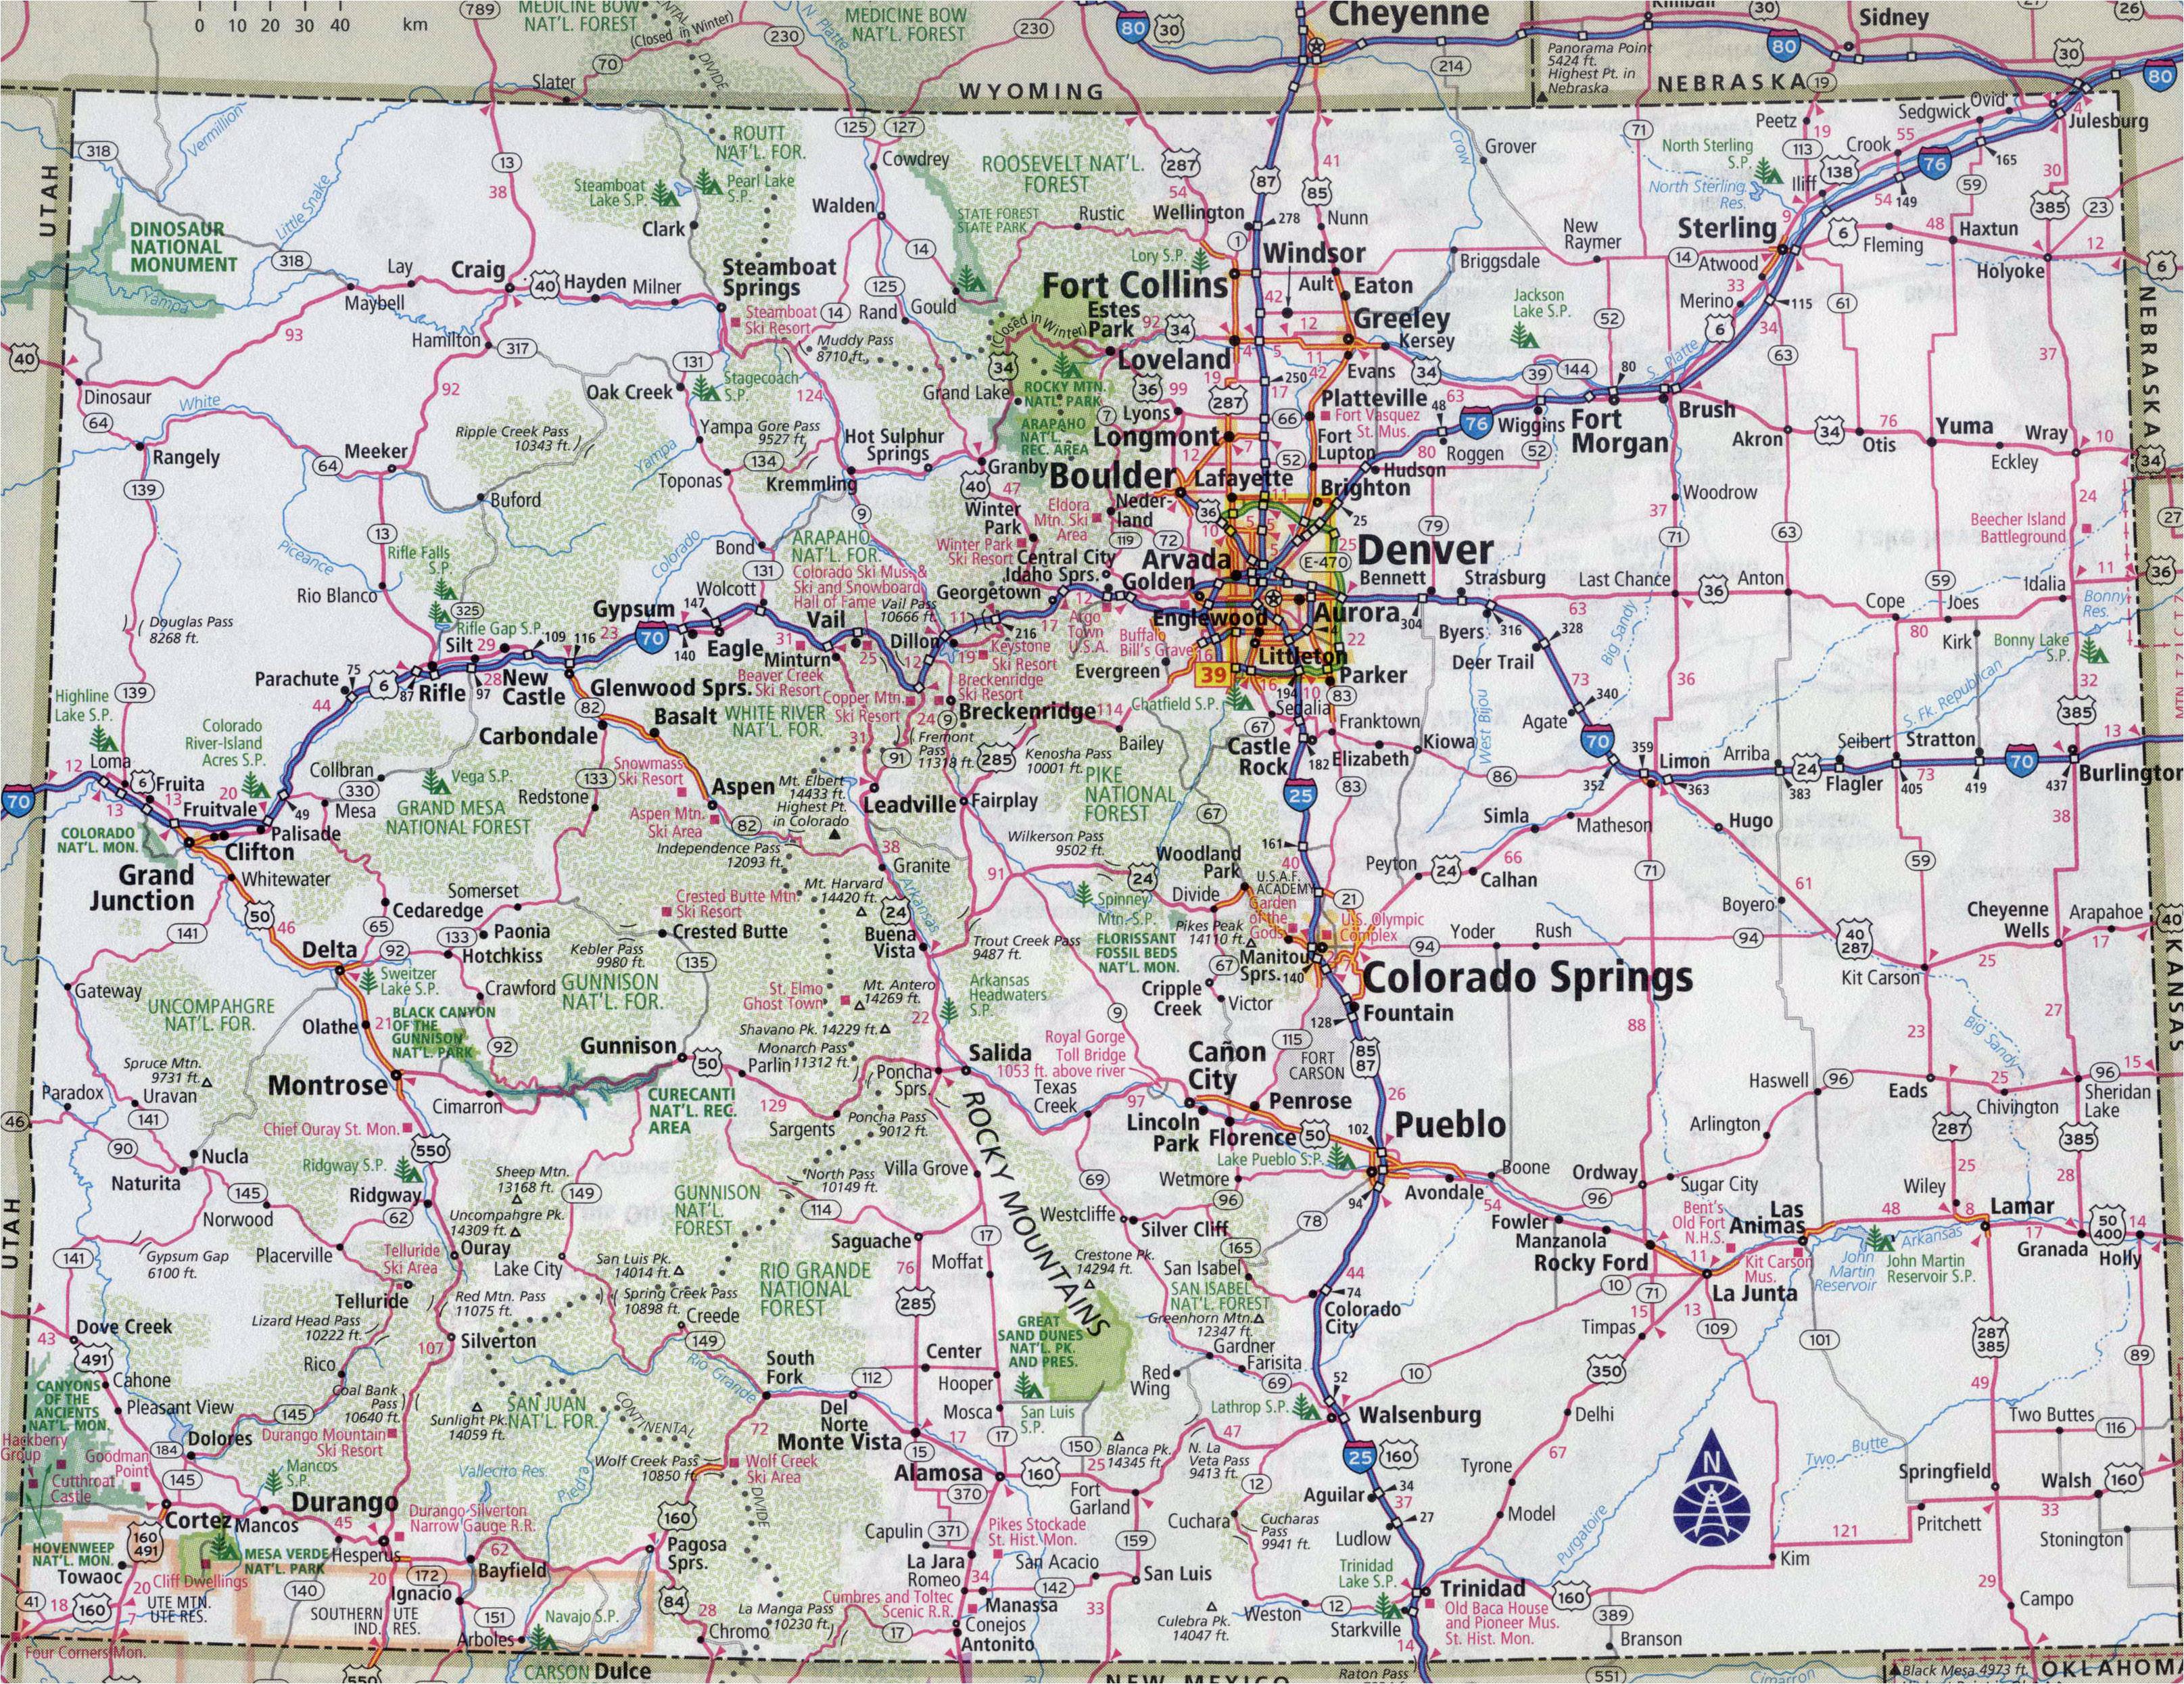 lake forest google maps outline detailed roads google maps colorado